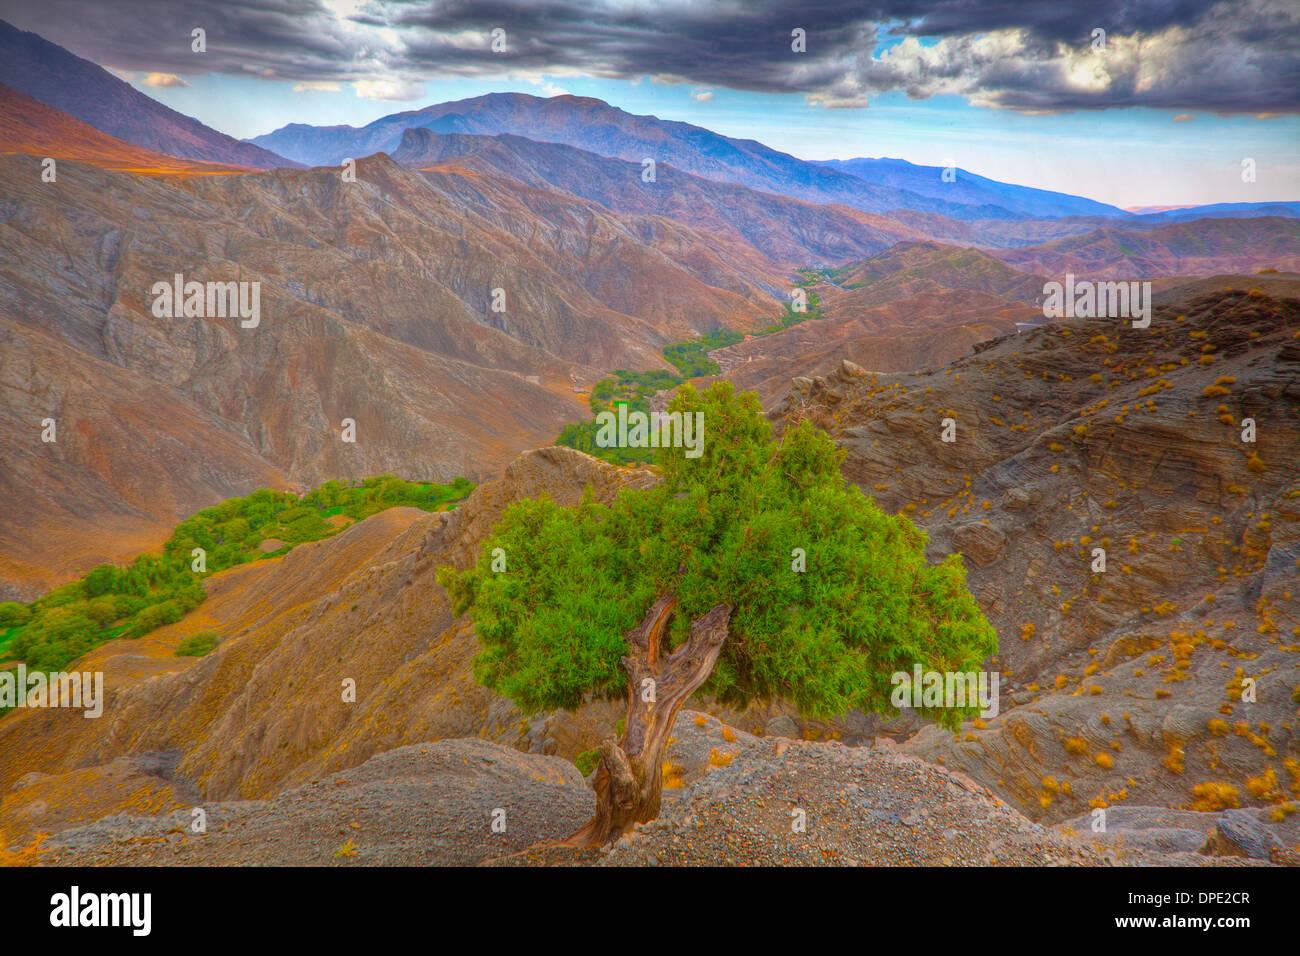 Atlas-Zeder im Atlas-Gebirge von Tizi n'Tichka Road, Marokko Cedrus Atlantica gesehen Stockbild